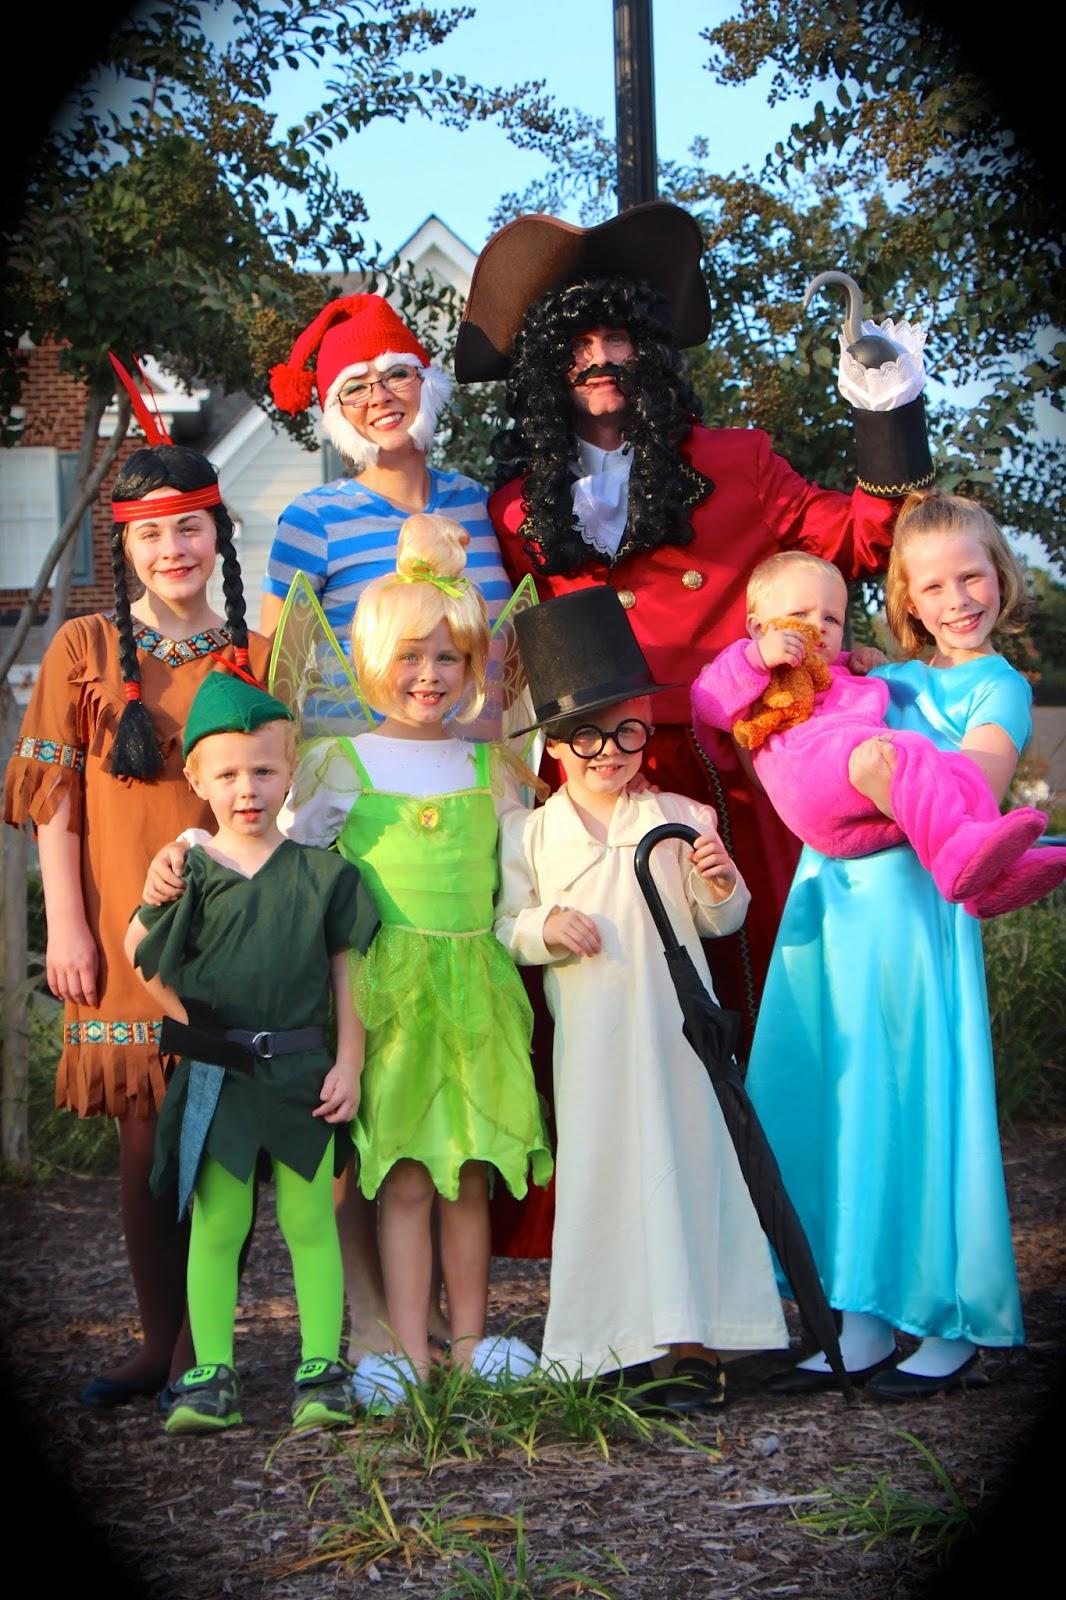 DIY Halloween Costume Inspiration- Gypsy - Polyvore by ...  Polyvore Disney Halloween Ideas